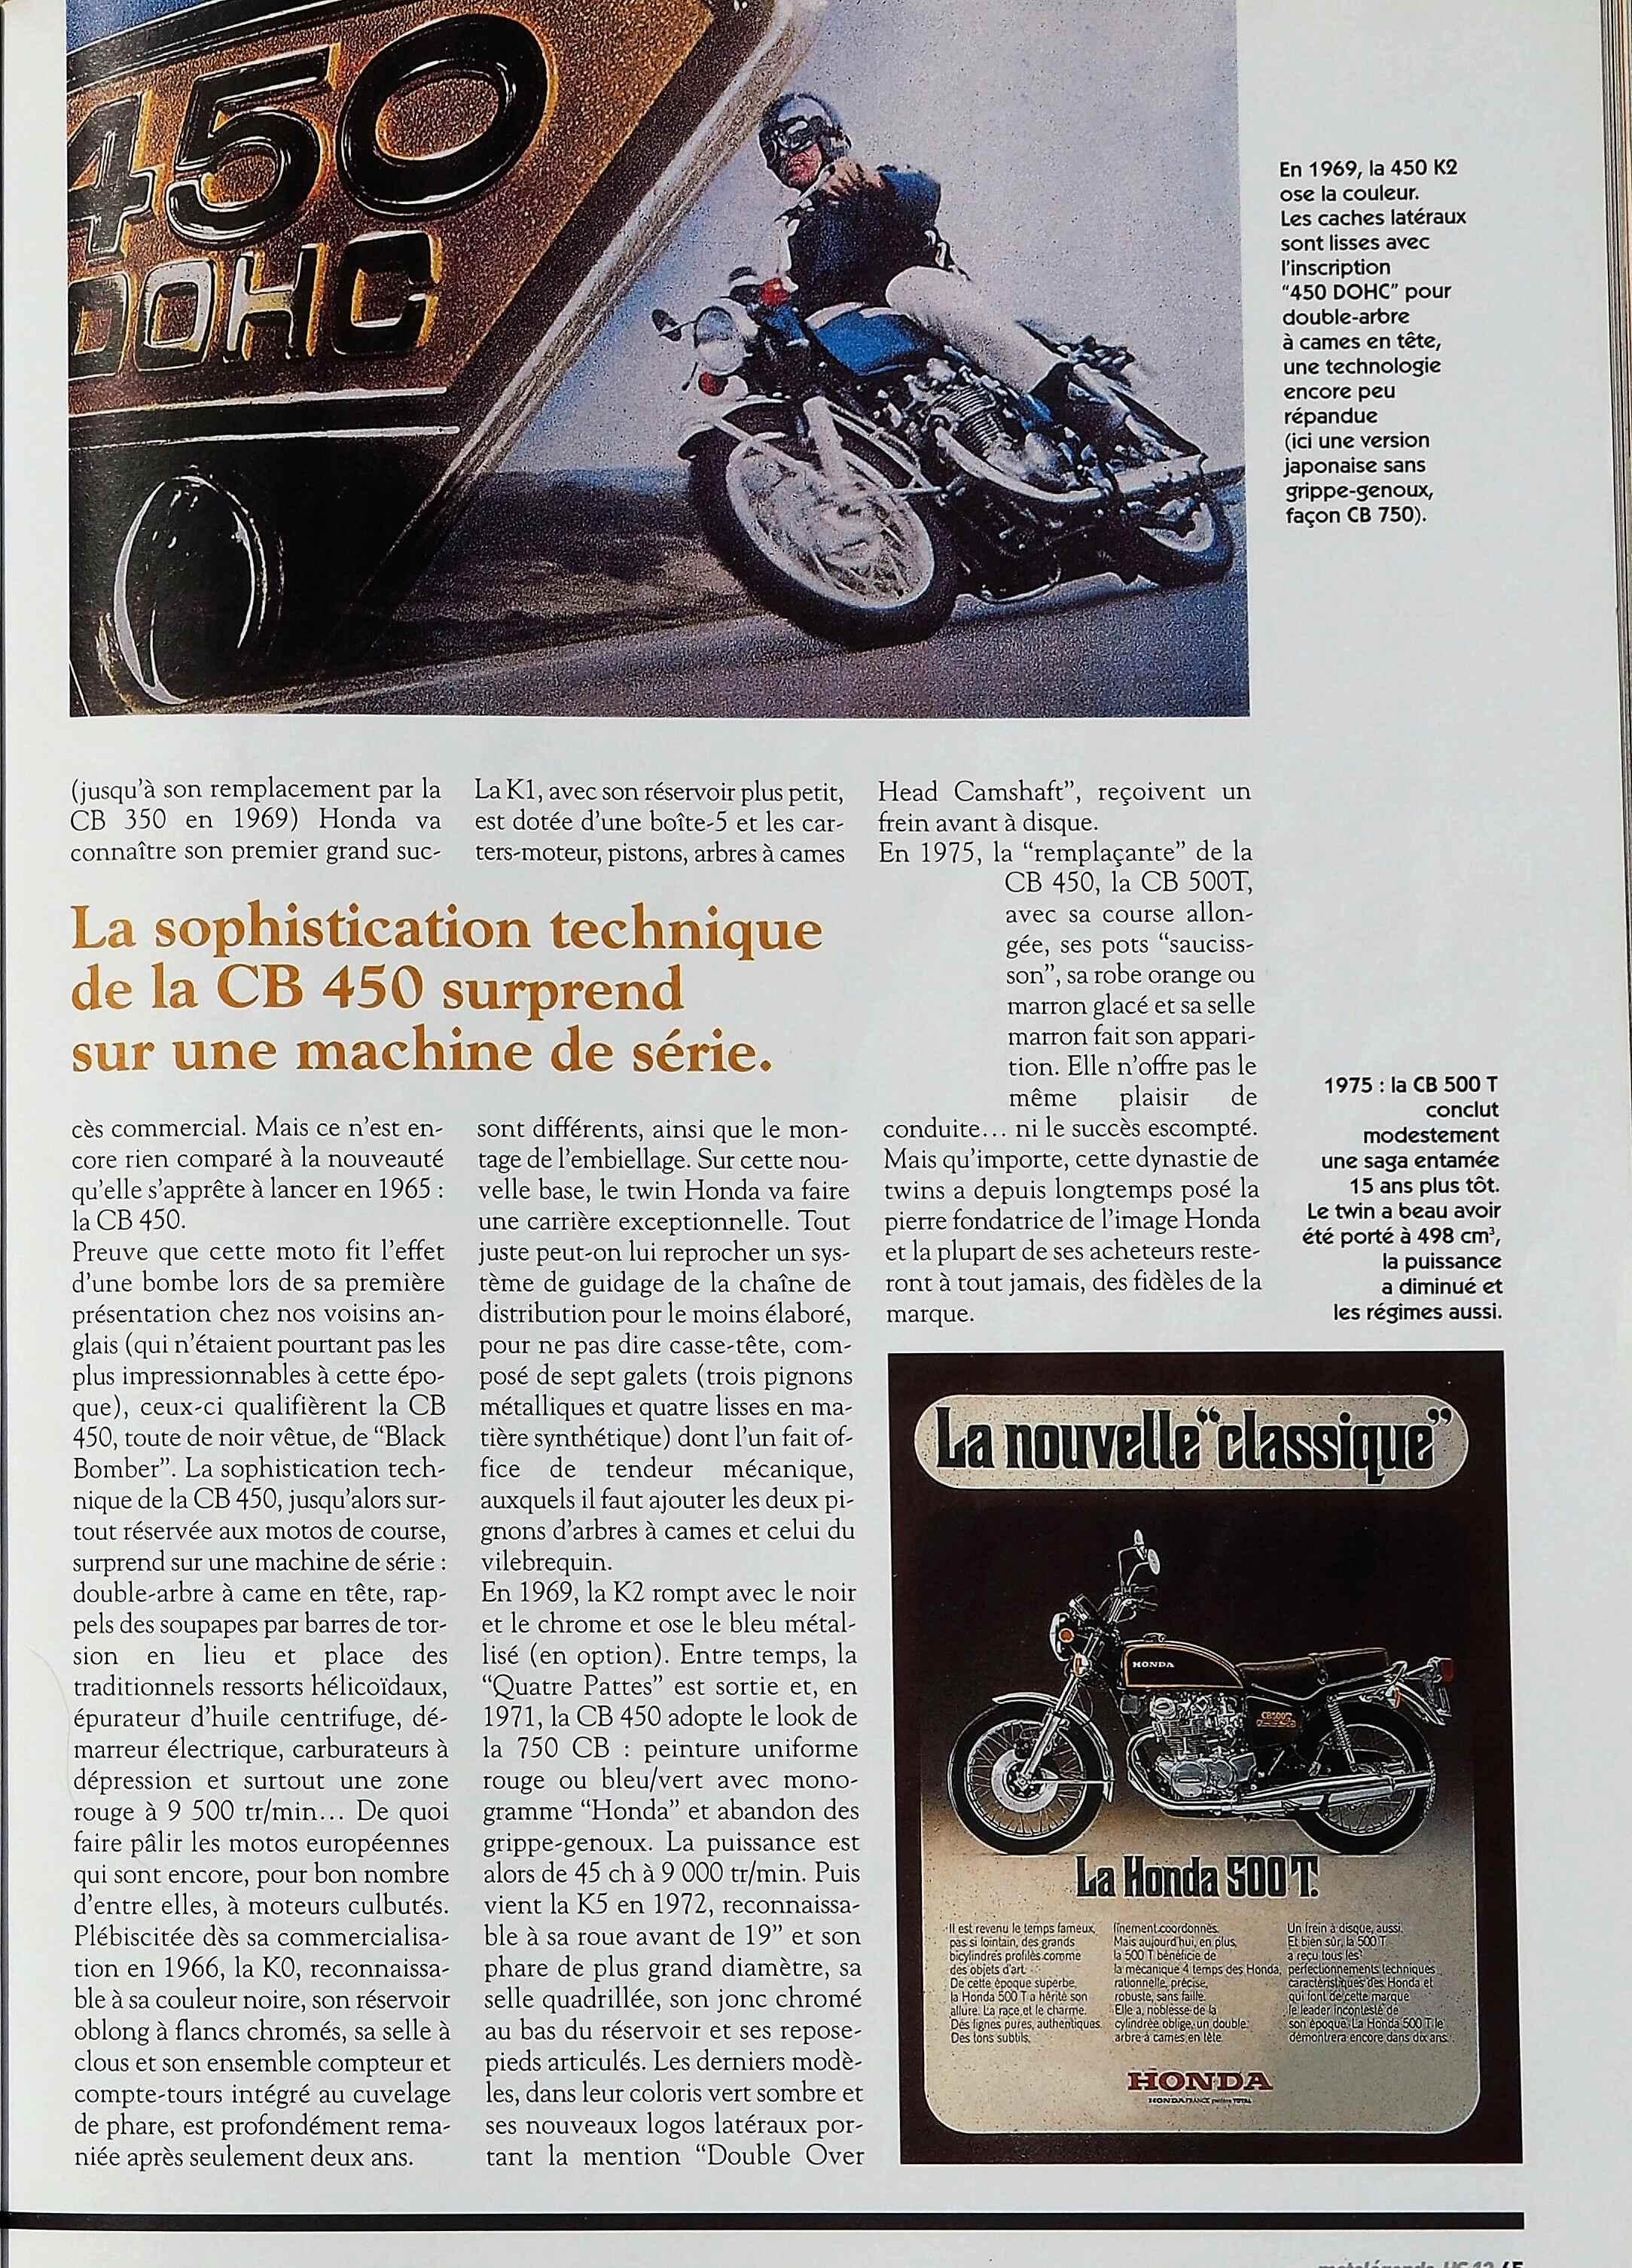 Histoire de la moto. - Page 2 P5091212